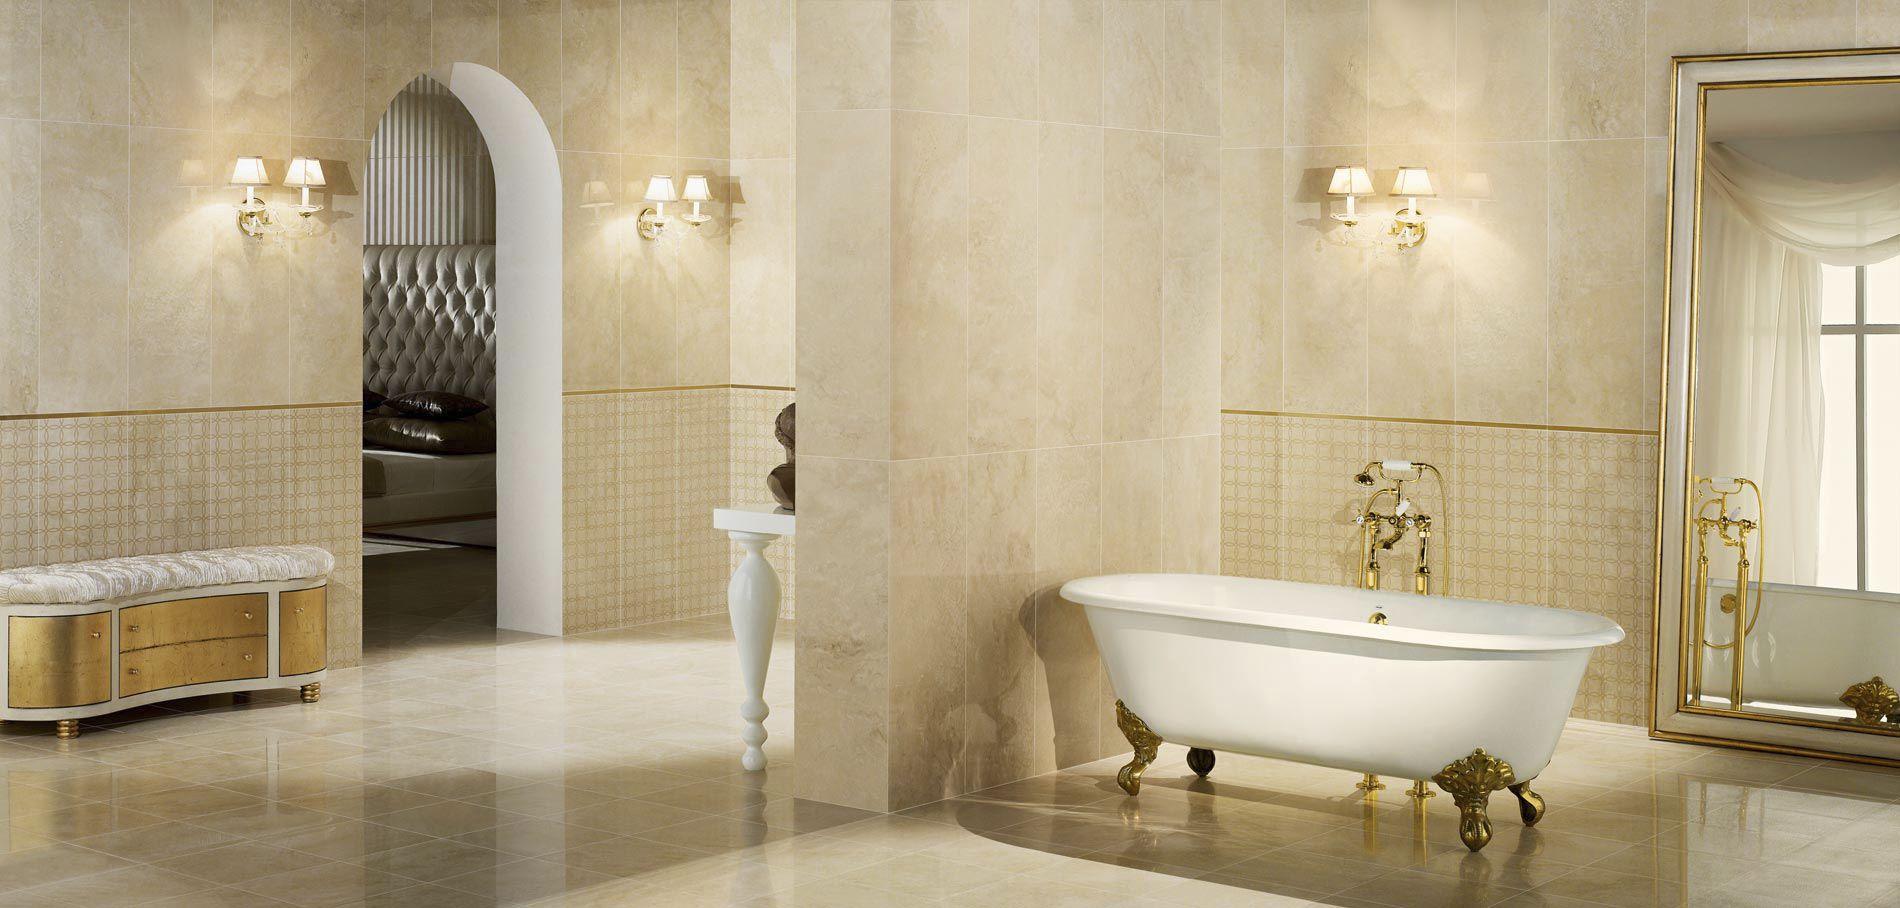 Indoor tile / wall / floor / porcelain stoneware - ROYALE - LOVE ...